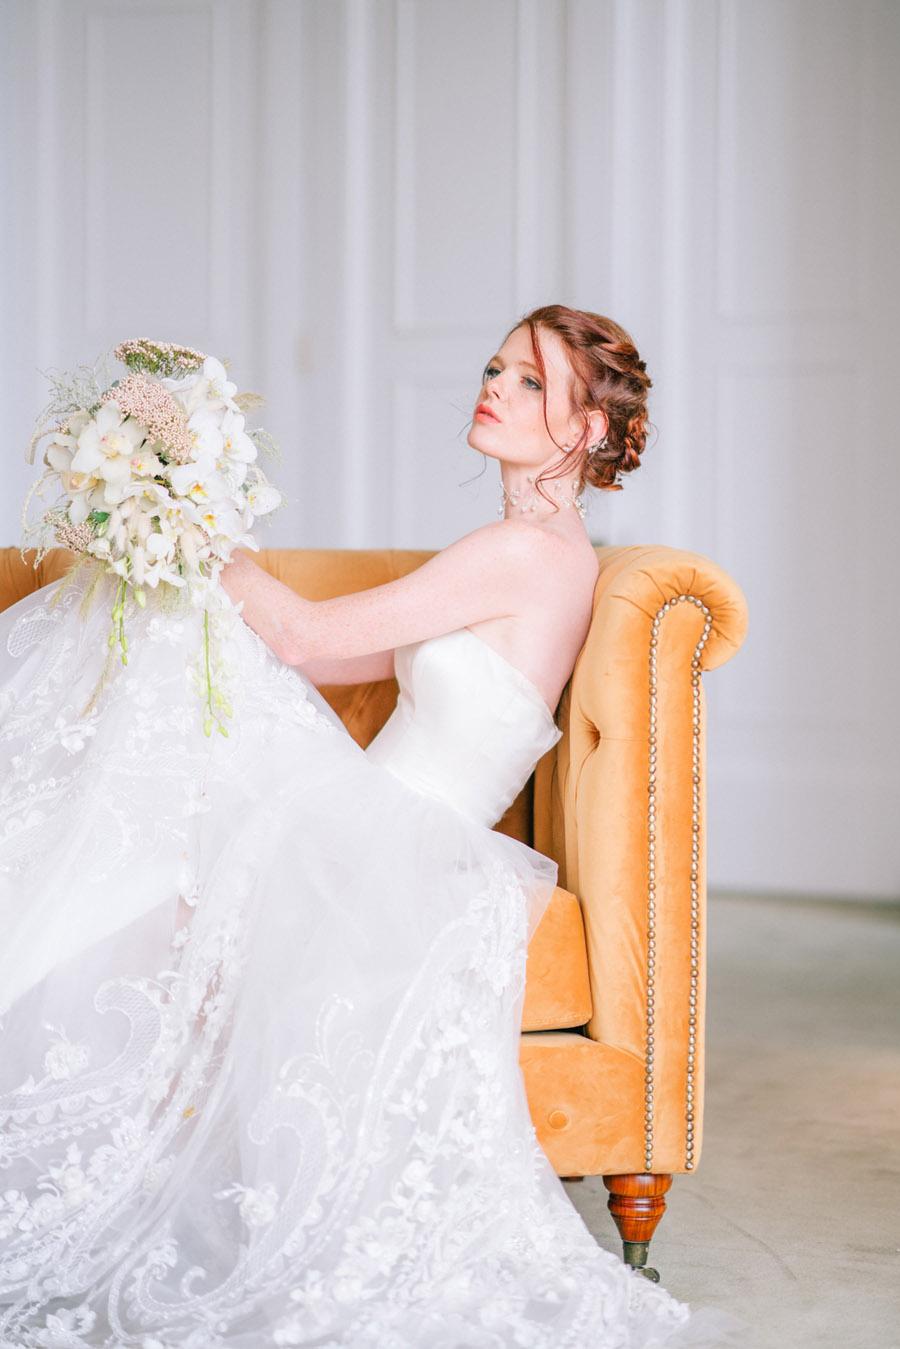 Beautiful emerald green and mustard wedding style ideas, photography by Ioana Porav (1)